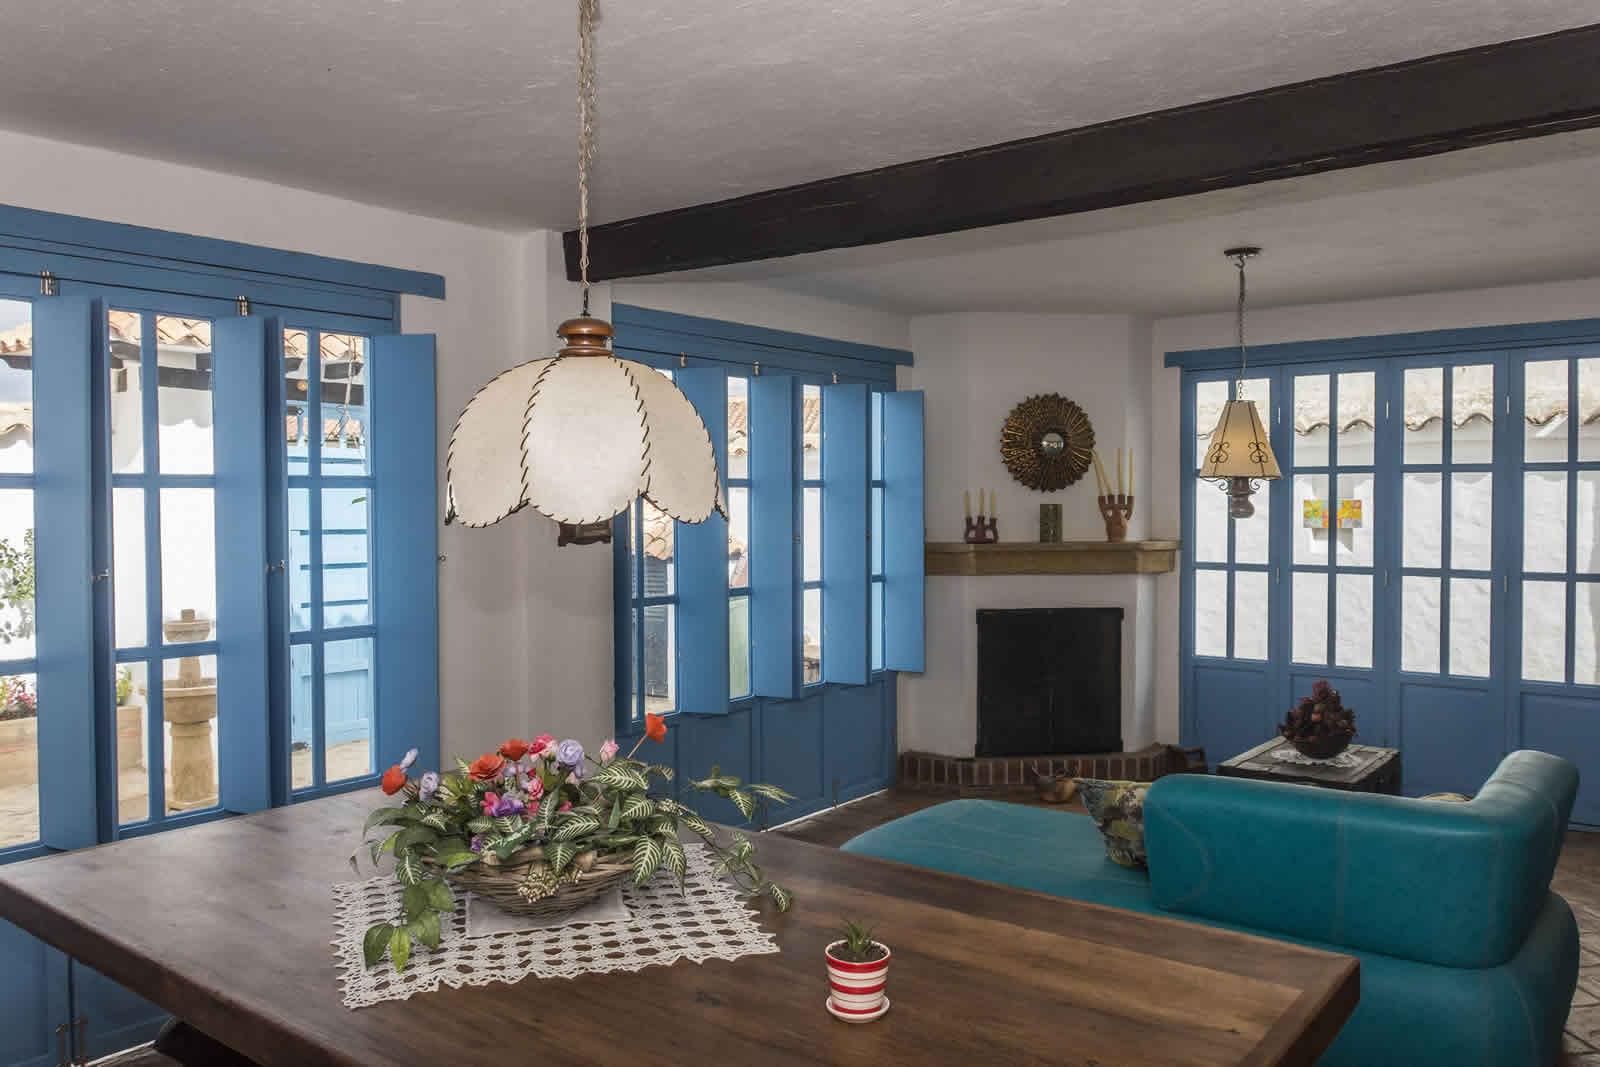 Alquiler Casa Azul en Villa de Leyva Comedor